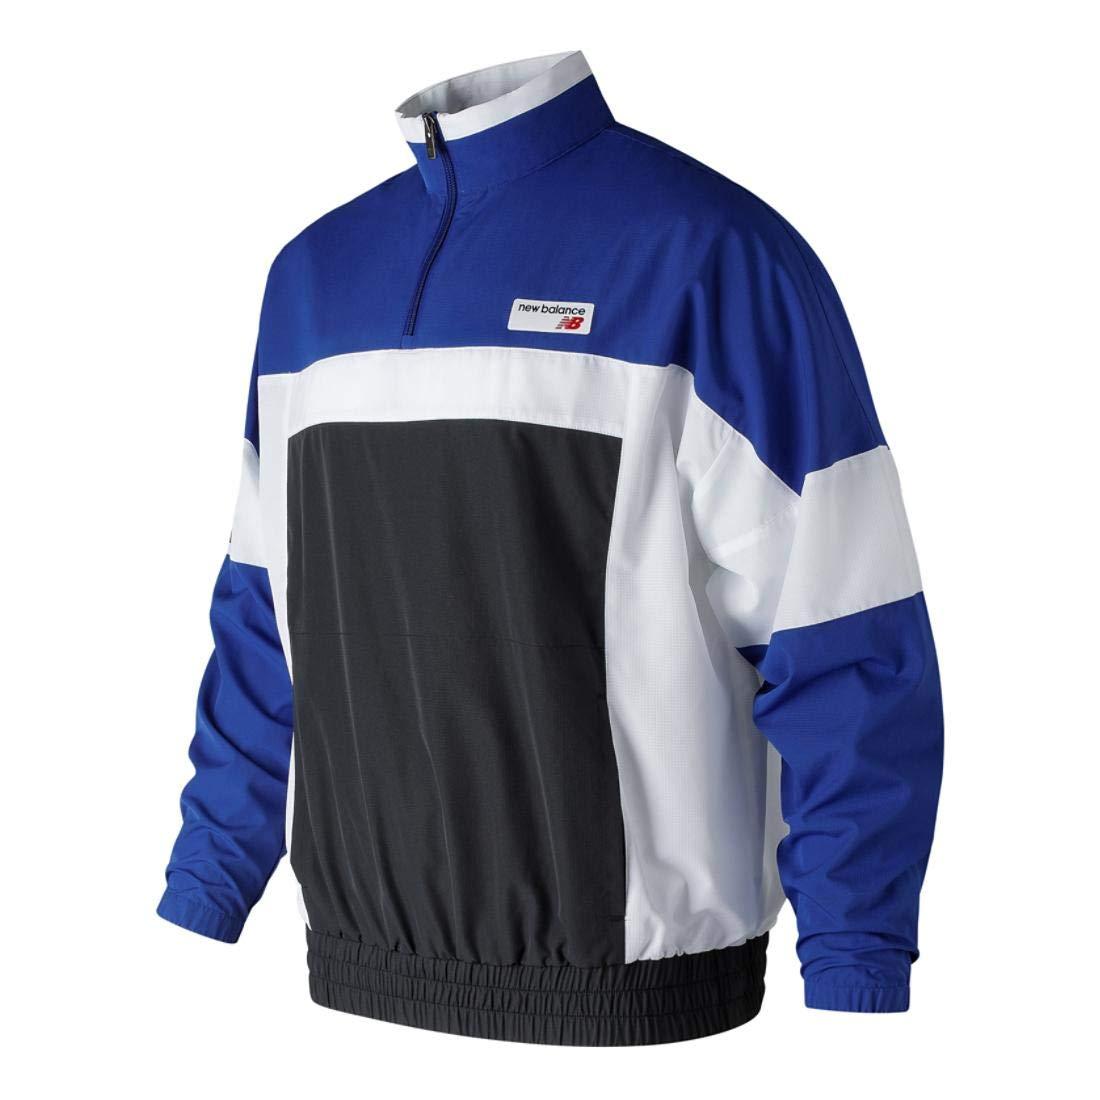 dfb30ffefaba3 Amazon.com: New Balance Men's Athletics Windbreaker Pullover Jacket: Sports  & Outdoors